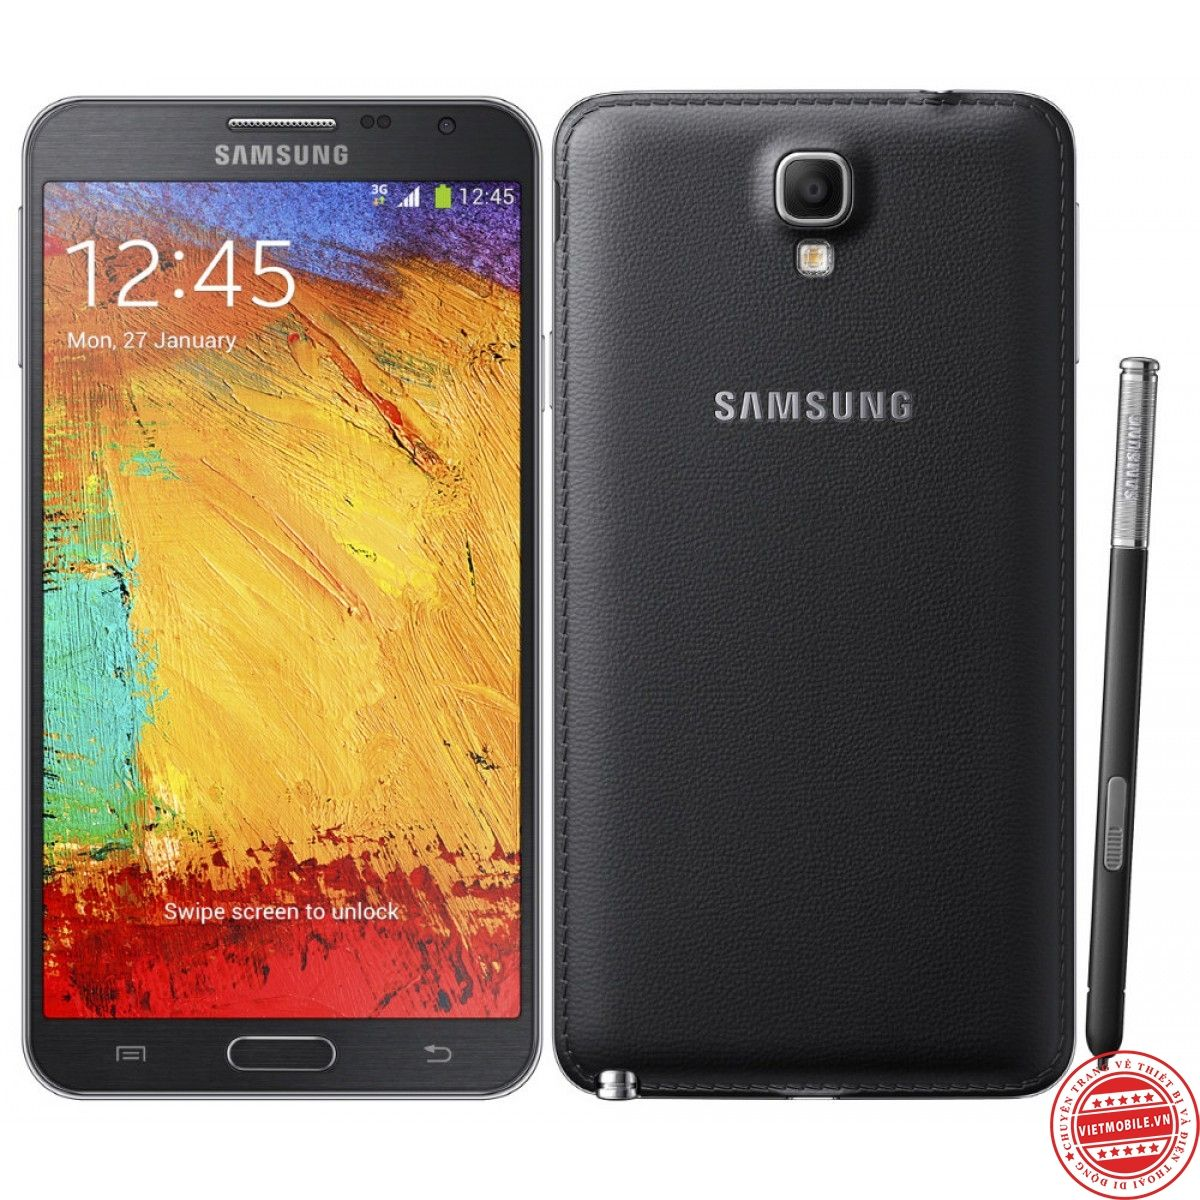 Sơ đồ mạch (Schematic) Samsung Galaxy Note 3 Neo SM-N7506V SM-N7508 ...